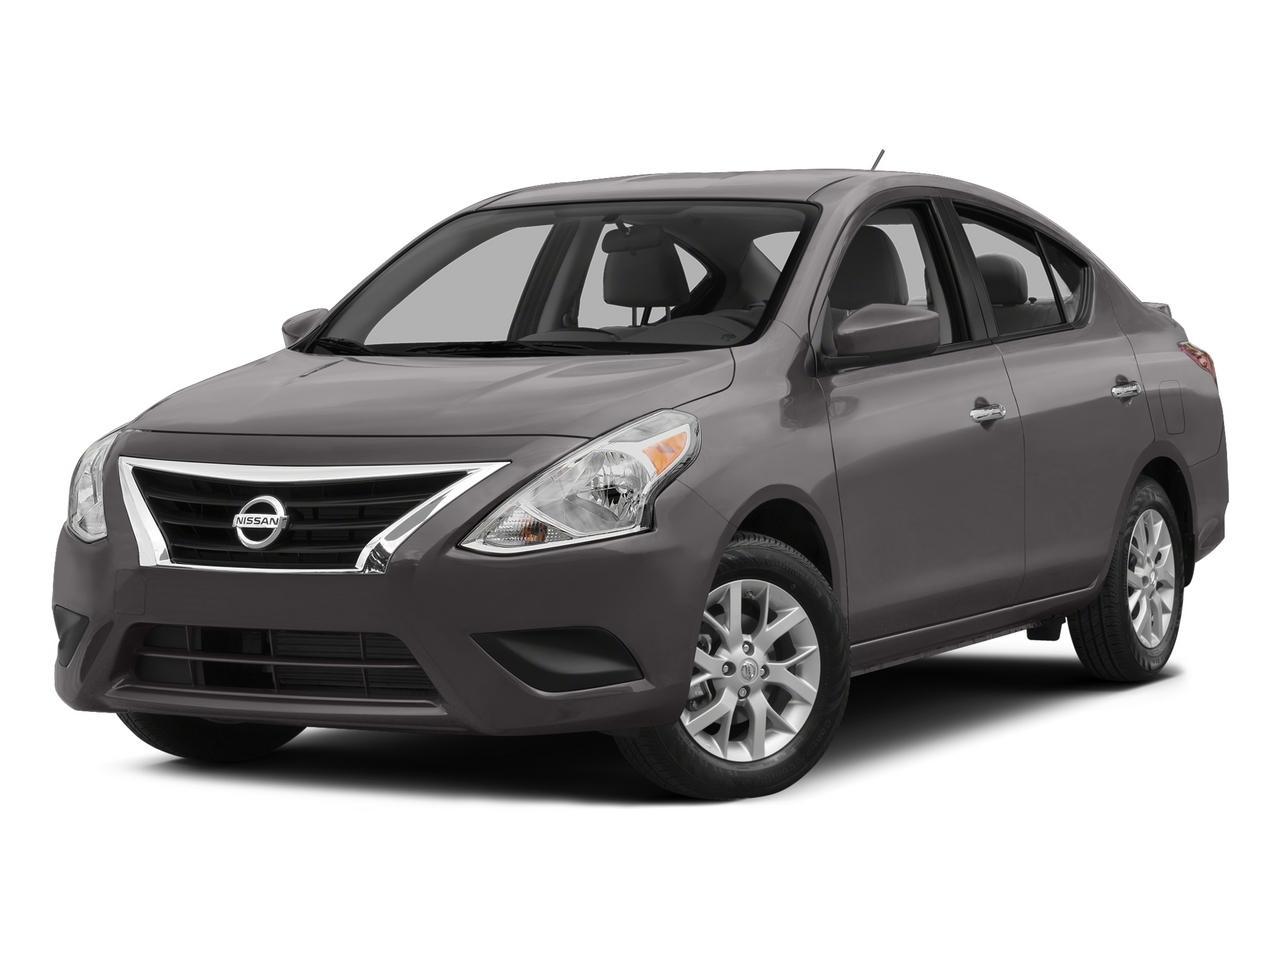 2015 Nissan Versa Vehicle Photo in VINCENNES, IN 47591-5519